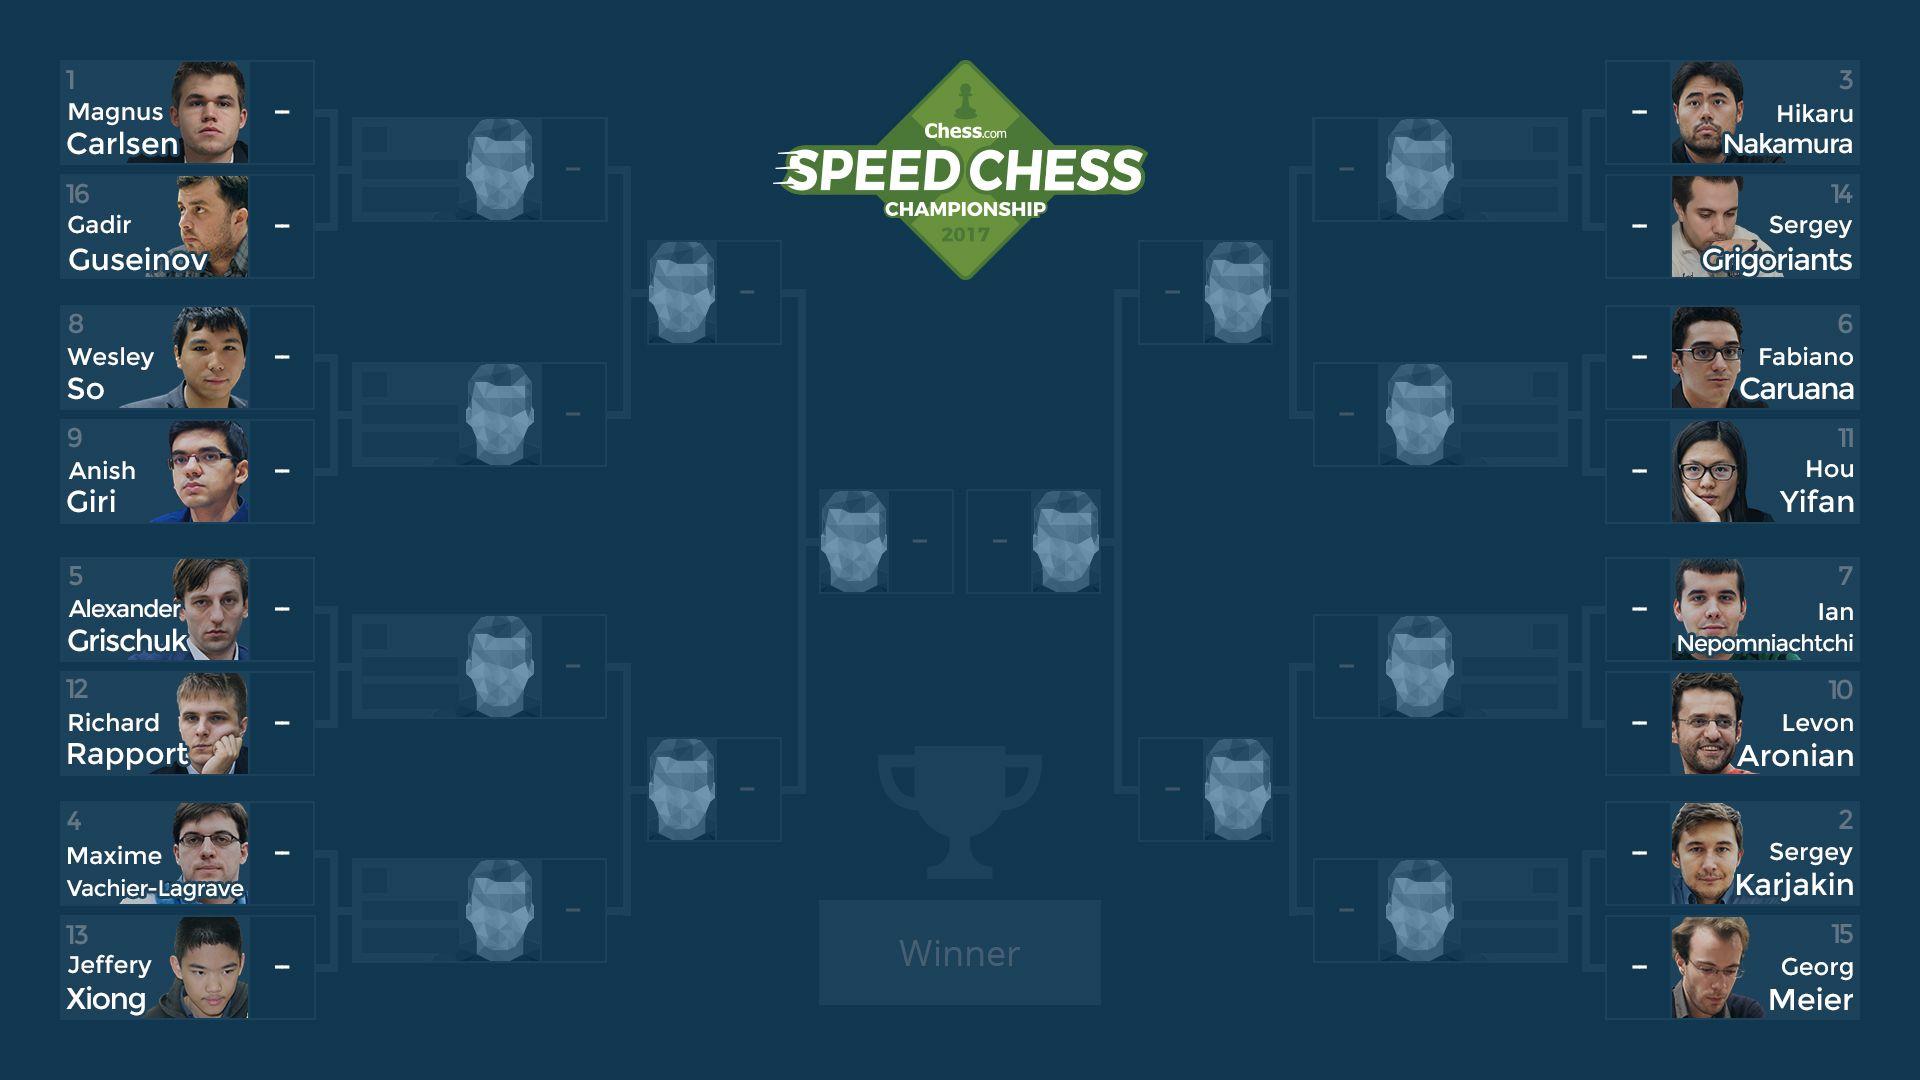 https://images.chesscomfiles.com/uploads/v1/images_users/tiny_mce/pete/phpgdlpOs.jpeg